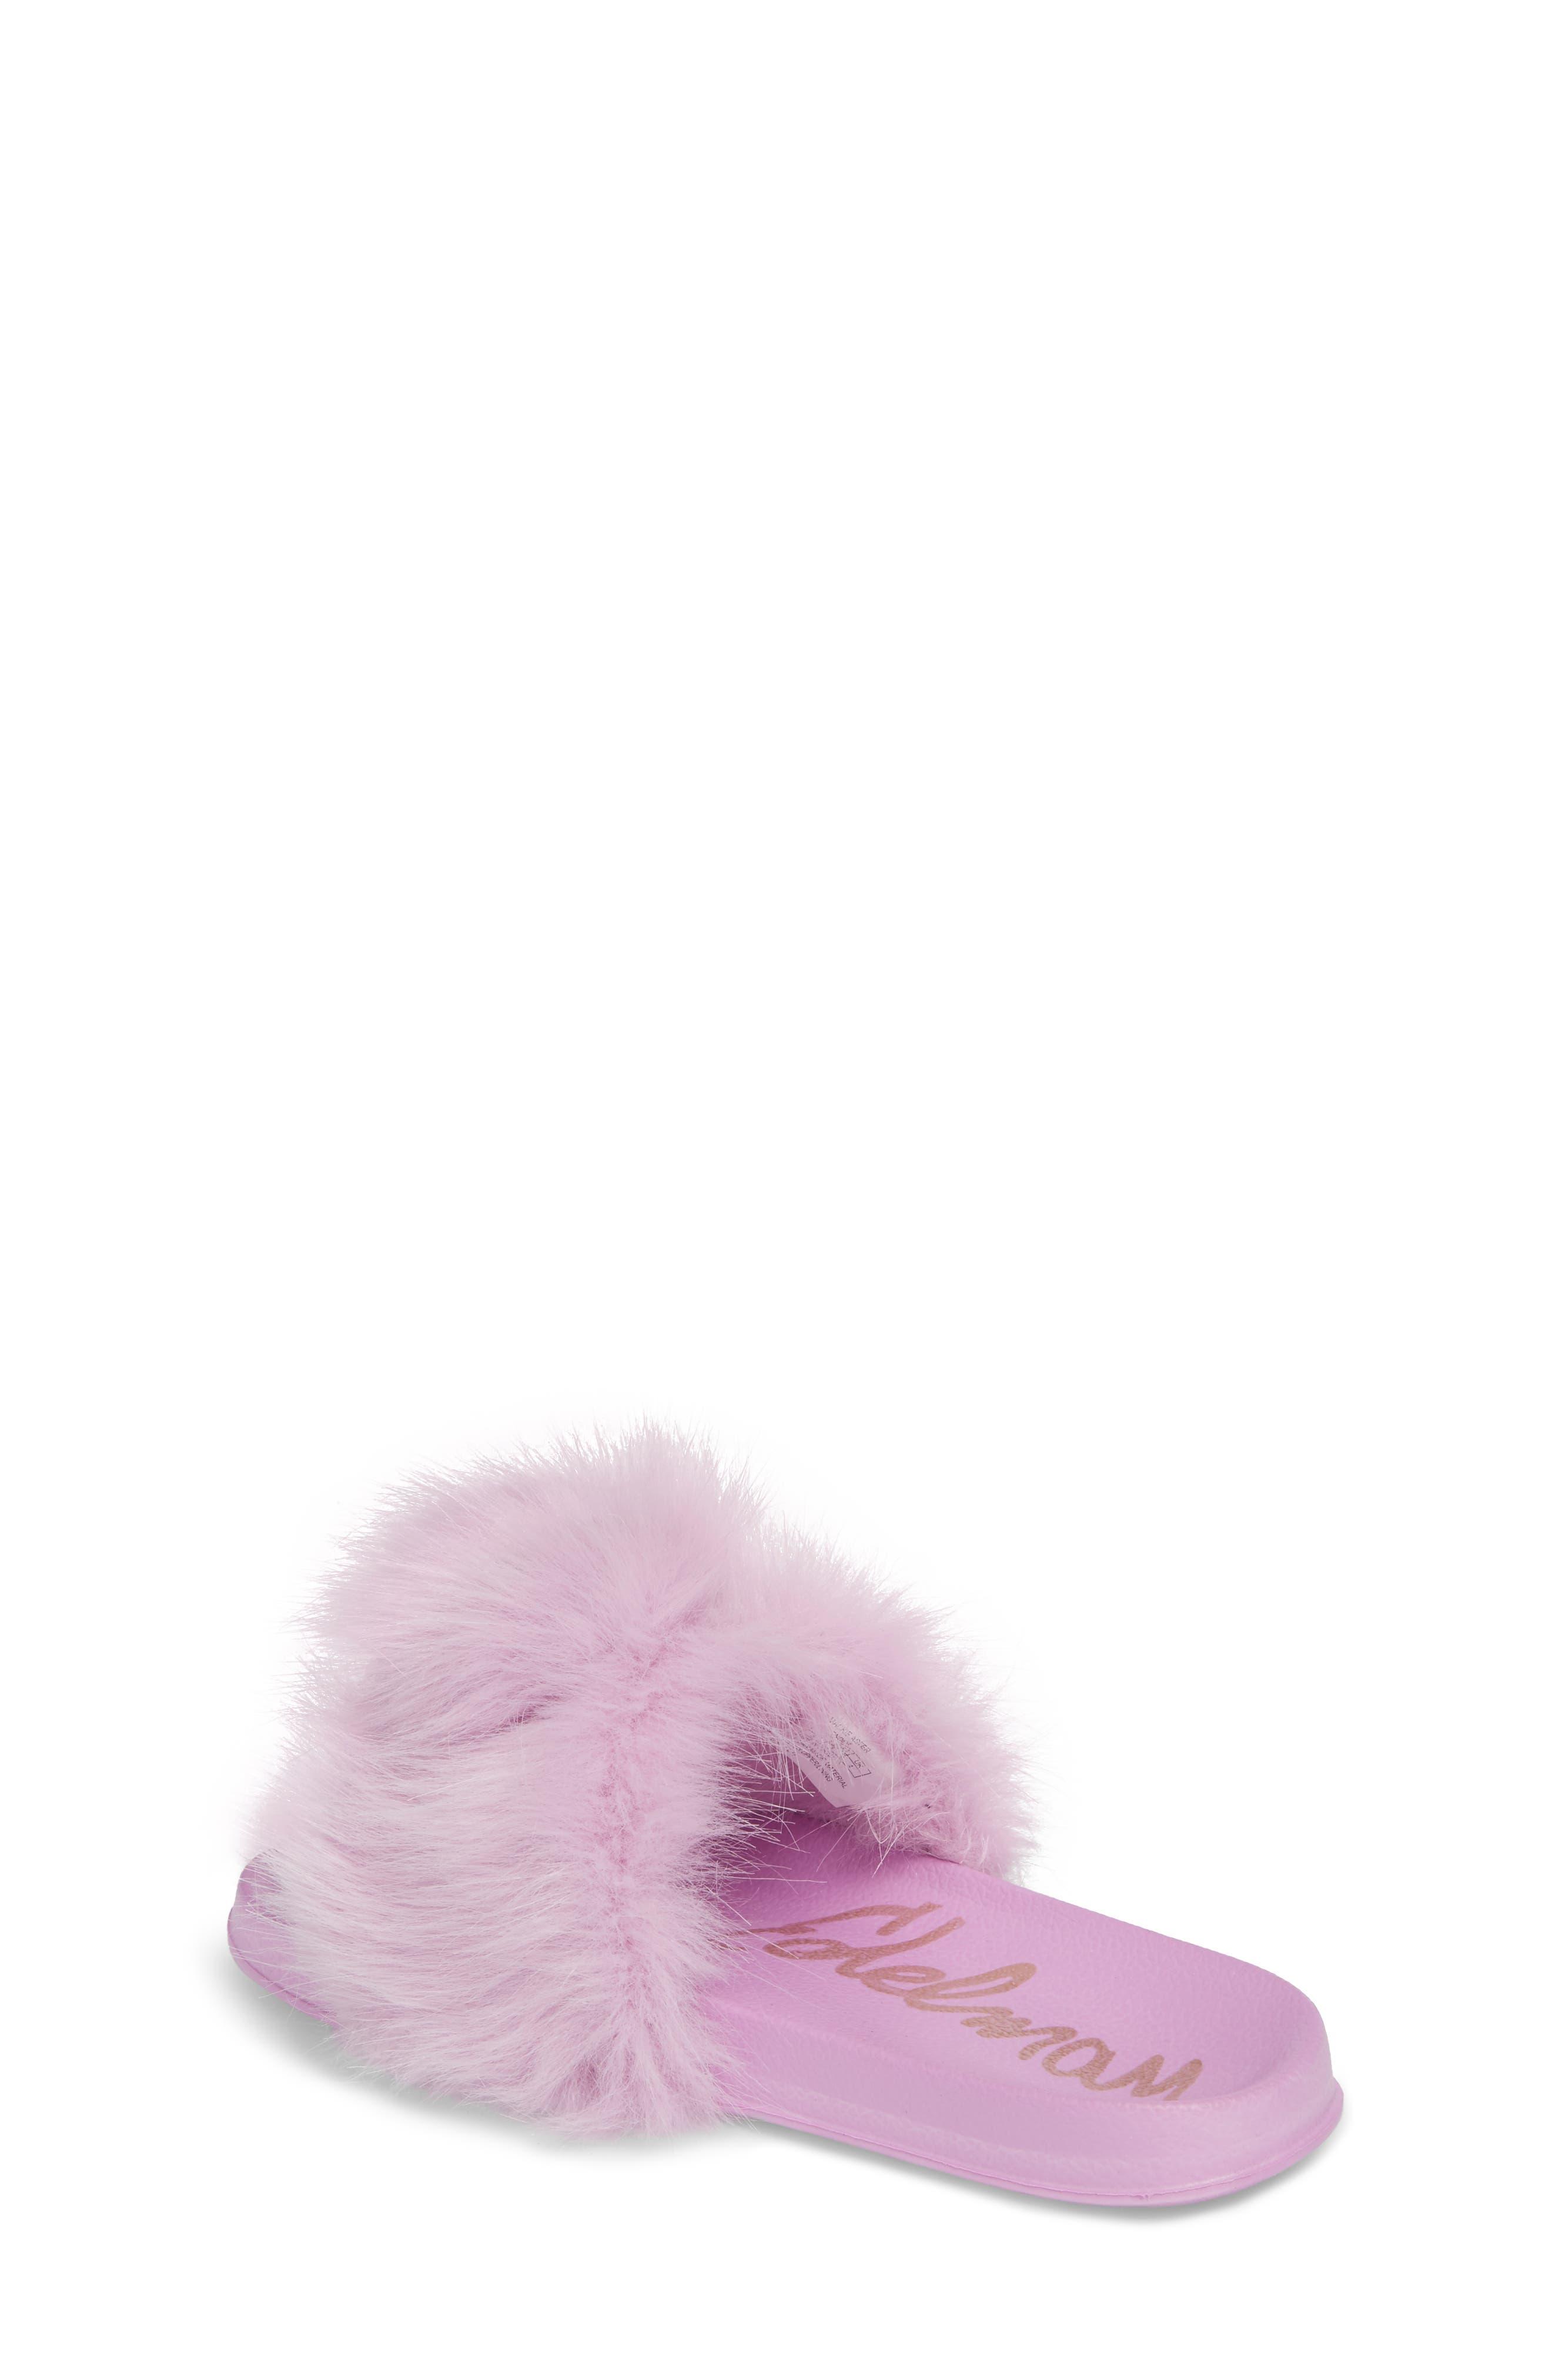 Mackie Aster Faux Fur Slide Sandal,                             Alternate thumbnail 2, color,                             510